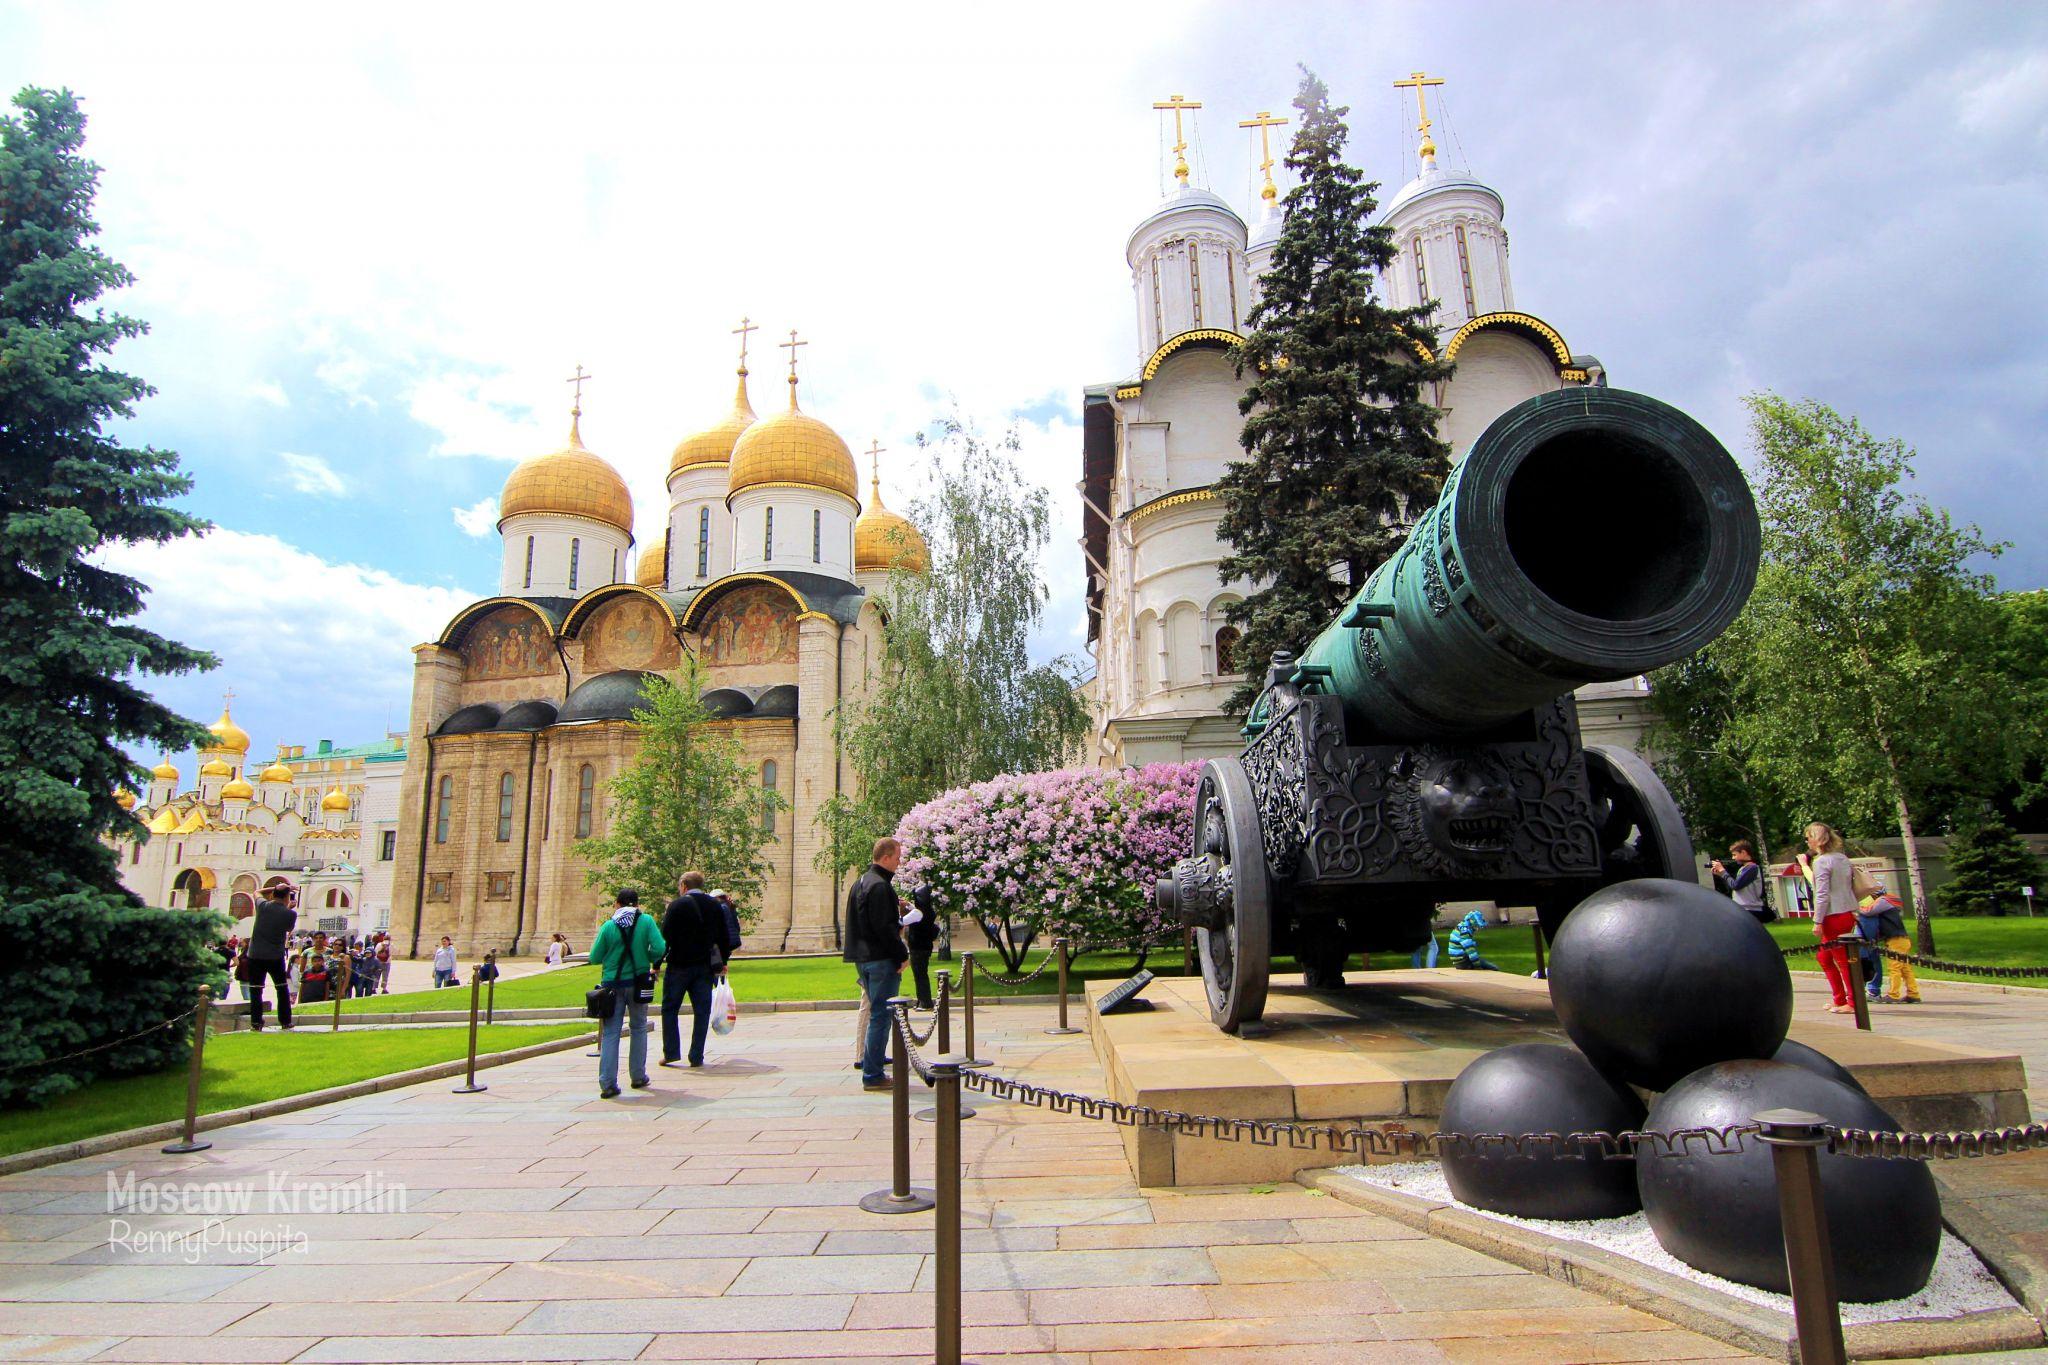 The Tsar Cannon Moscow Kremlin, Russian Federation